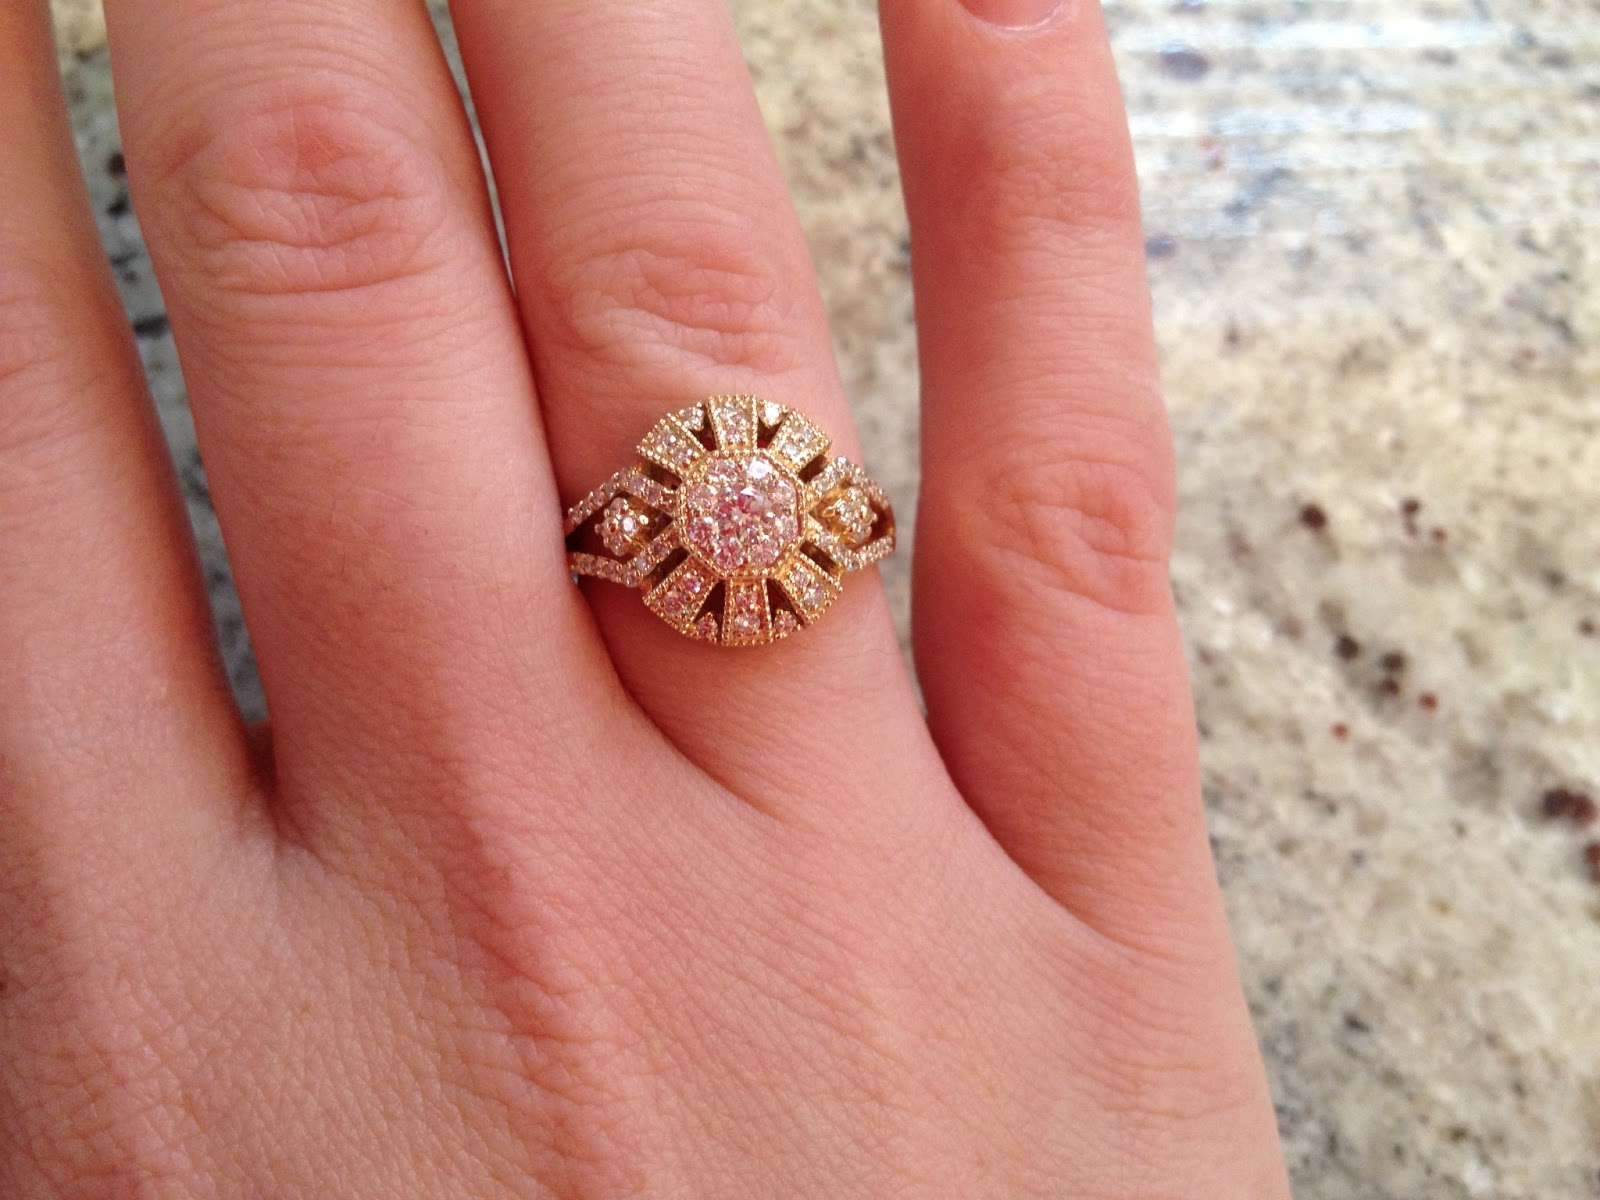 cashmere white, granite, diamonds, wedding ring, engagement ring, unique ring, diamonds, vintage ring, vintage wedding ring, gold, diamonds and gold, hand model,